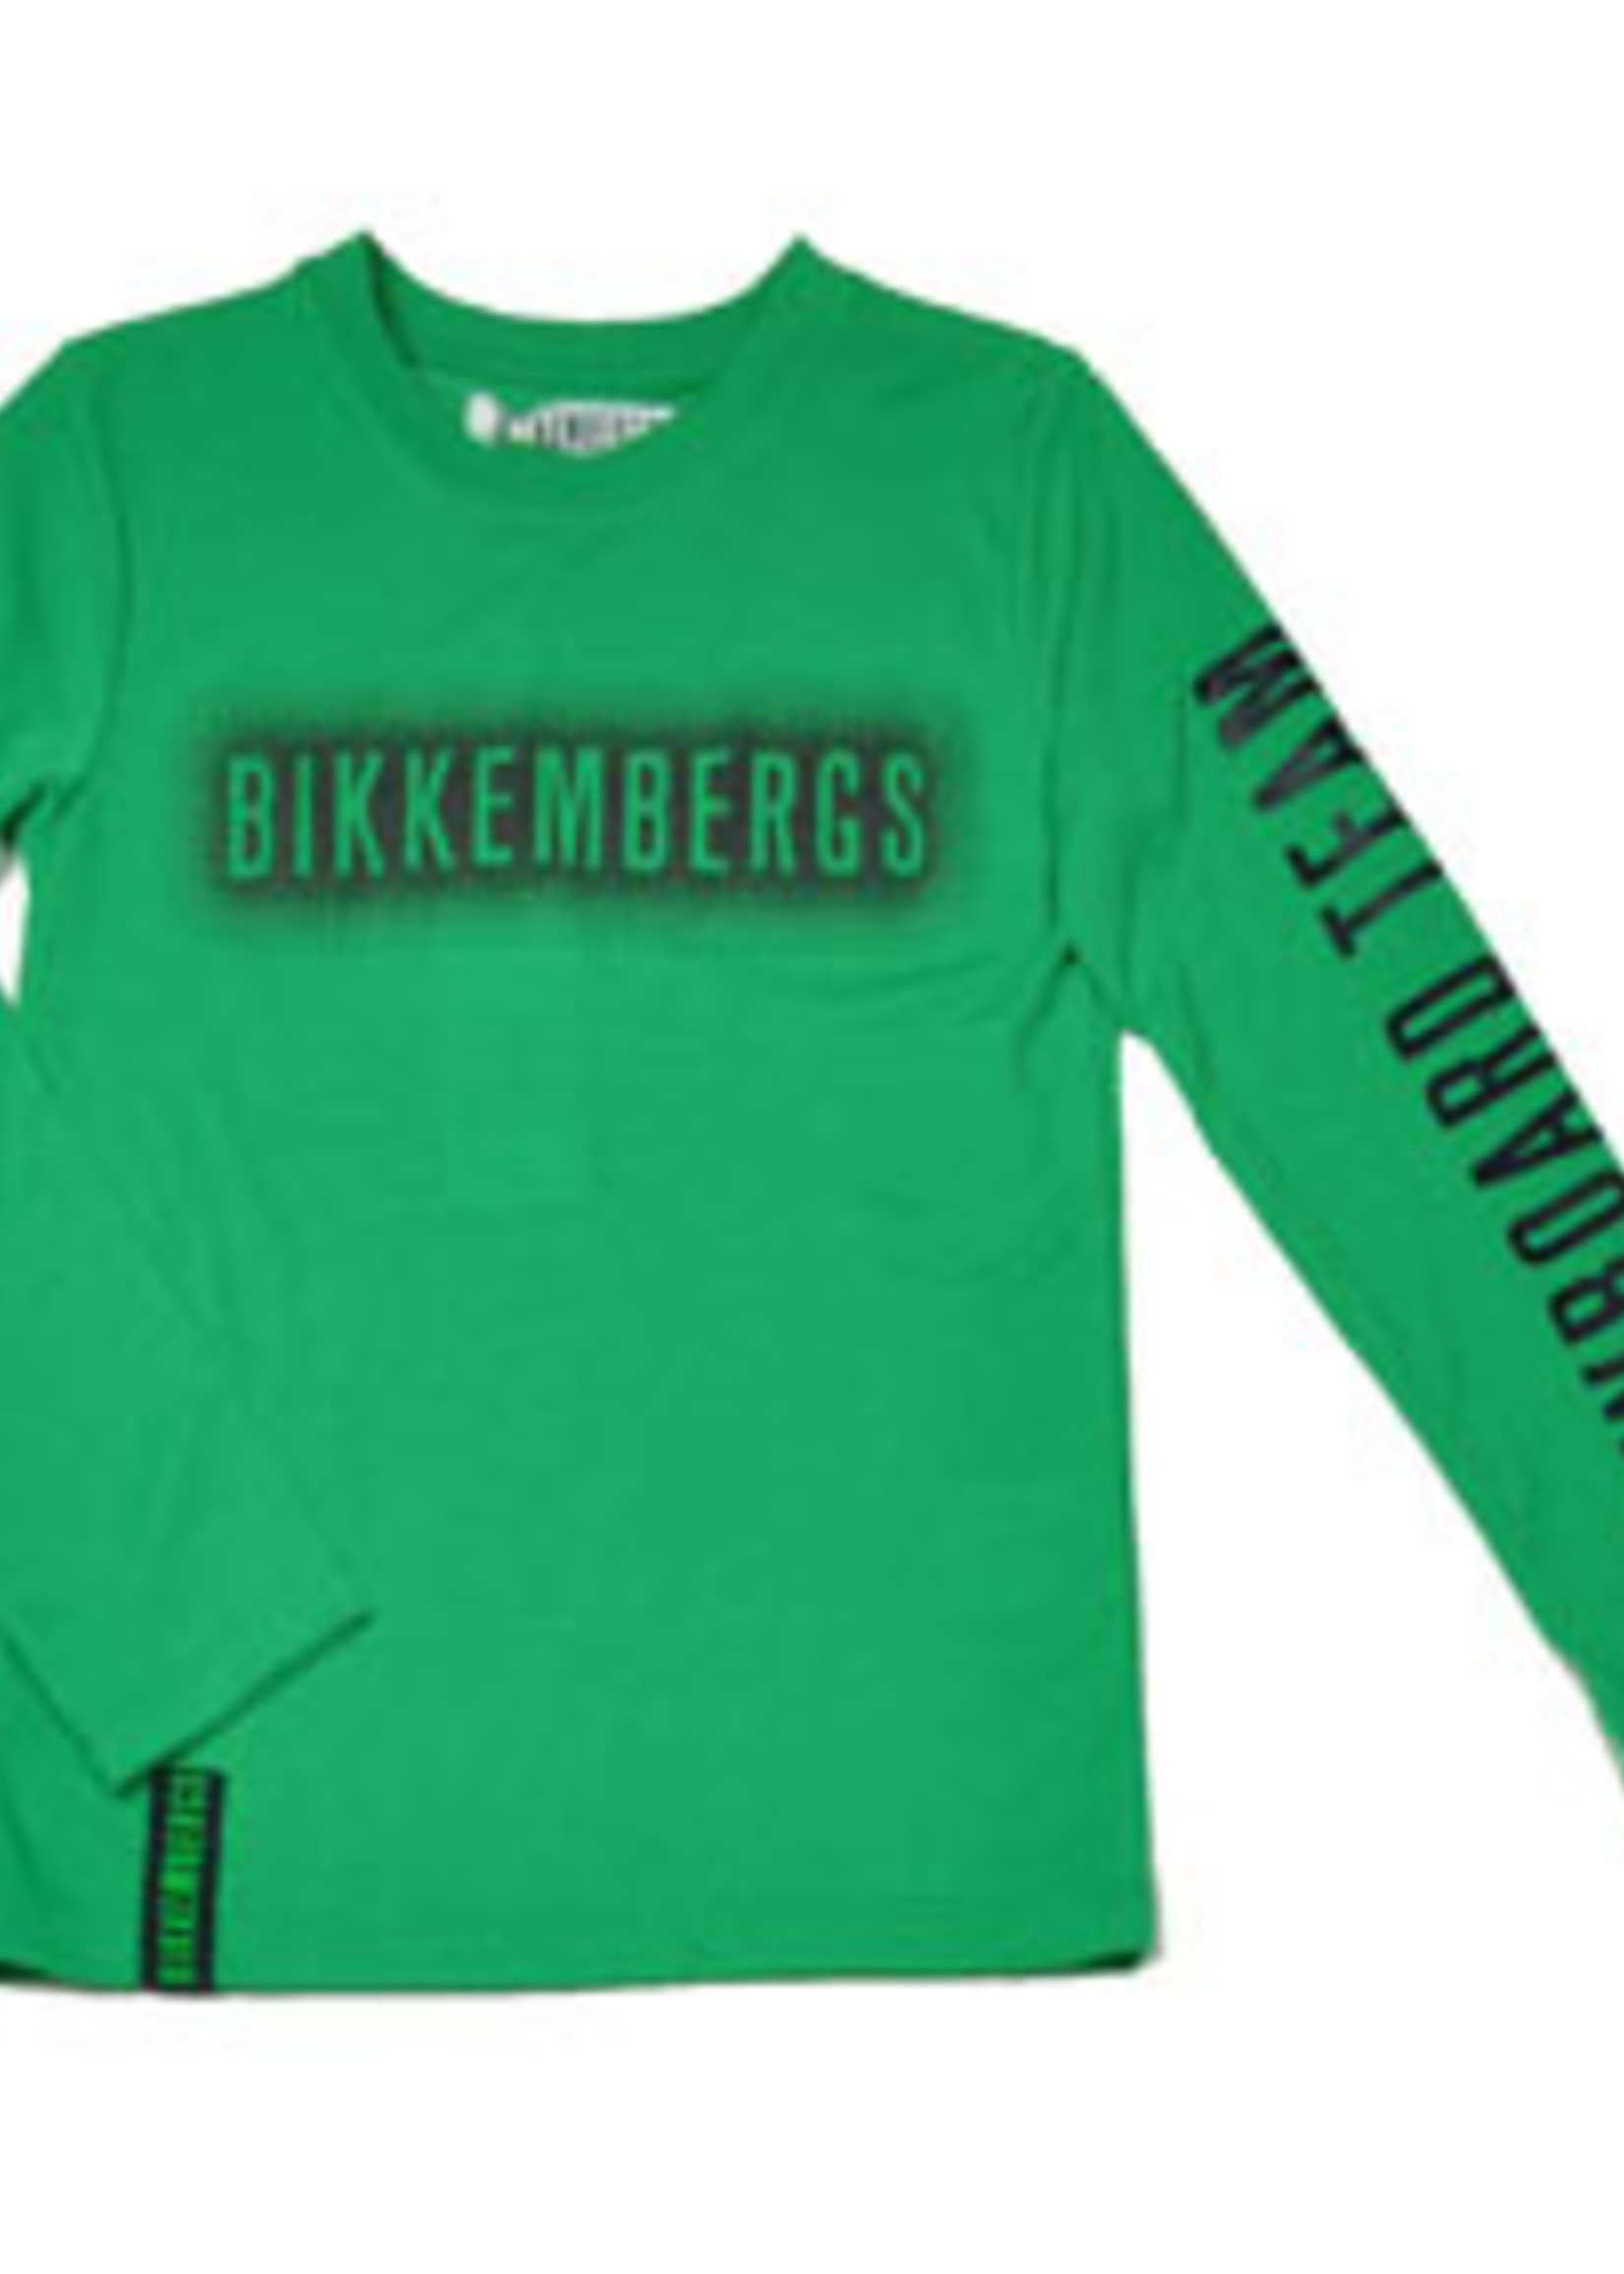 Bikkembergs BIKKEMBERGS TSHIRT GREEN